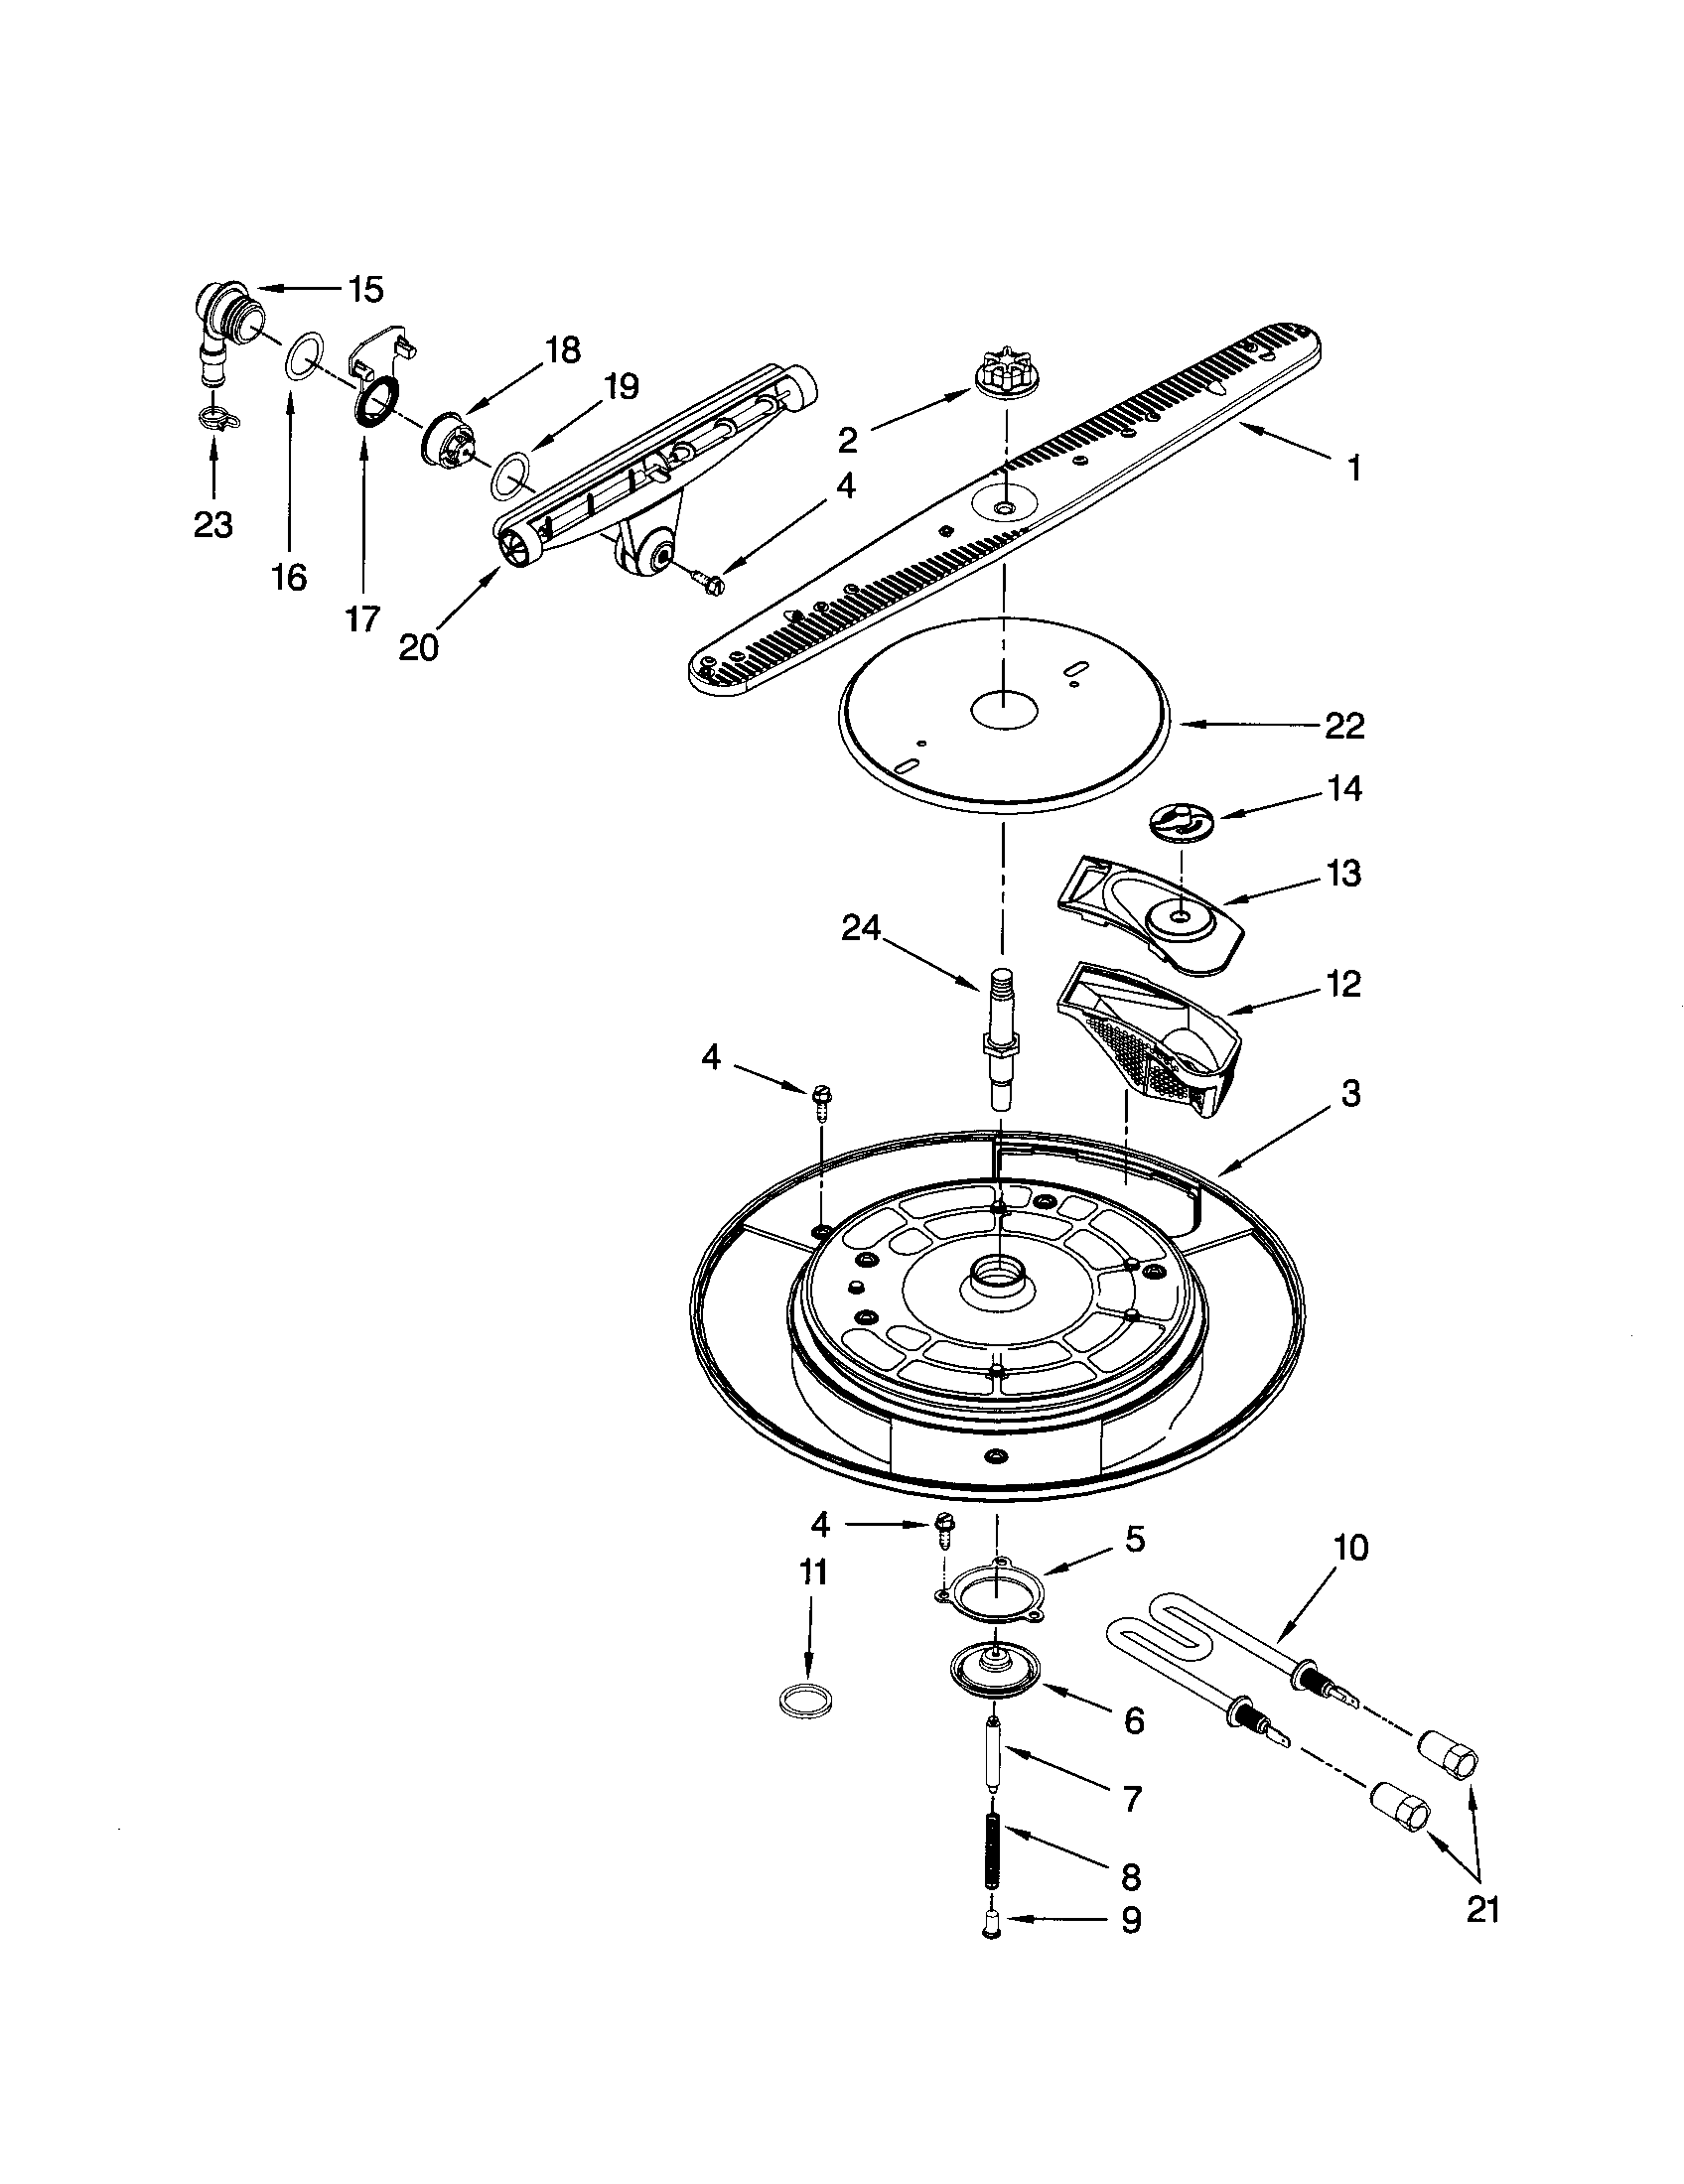 27 Kenmore Elite Dishwasher 665 Parts Diagram